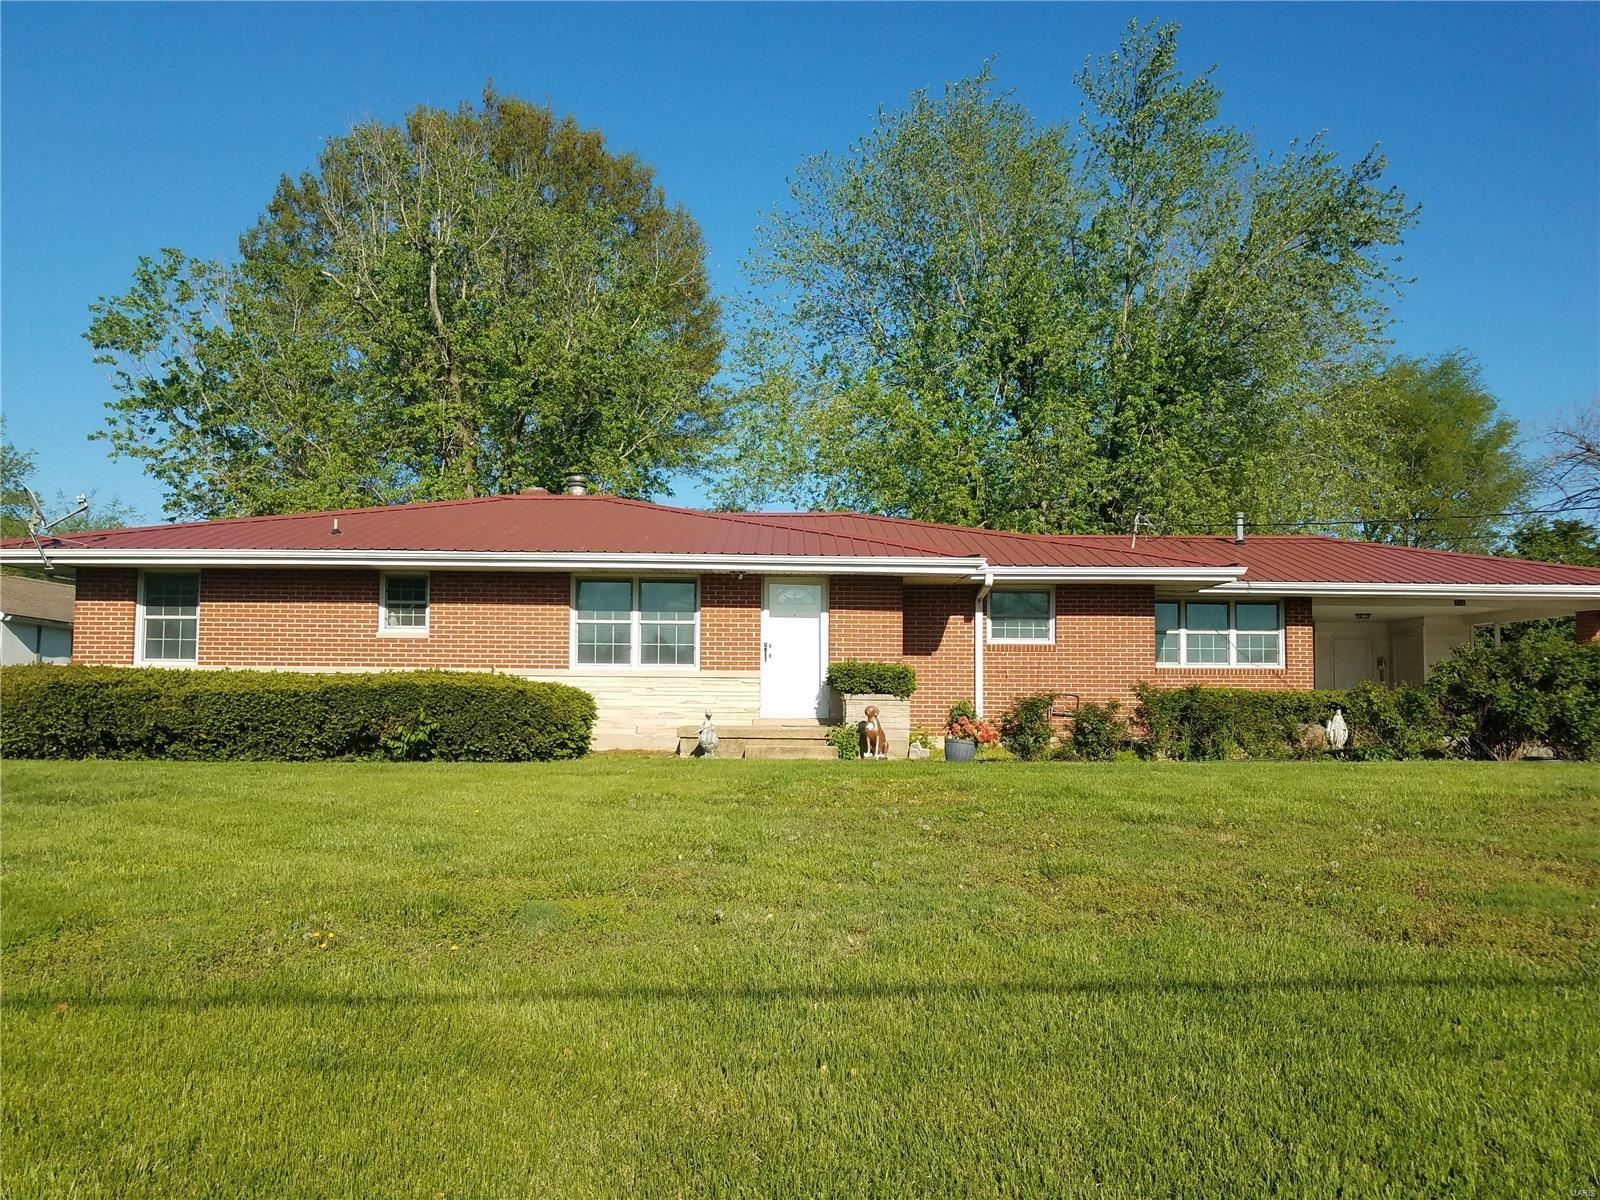 Photo of 710 North Farmington, Jackson, MO 63755 (MLS # 21028543)